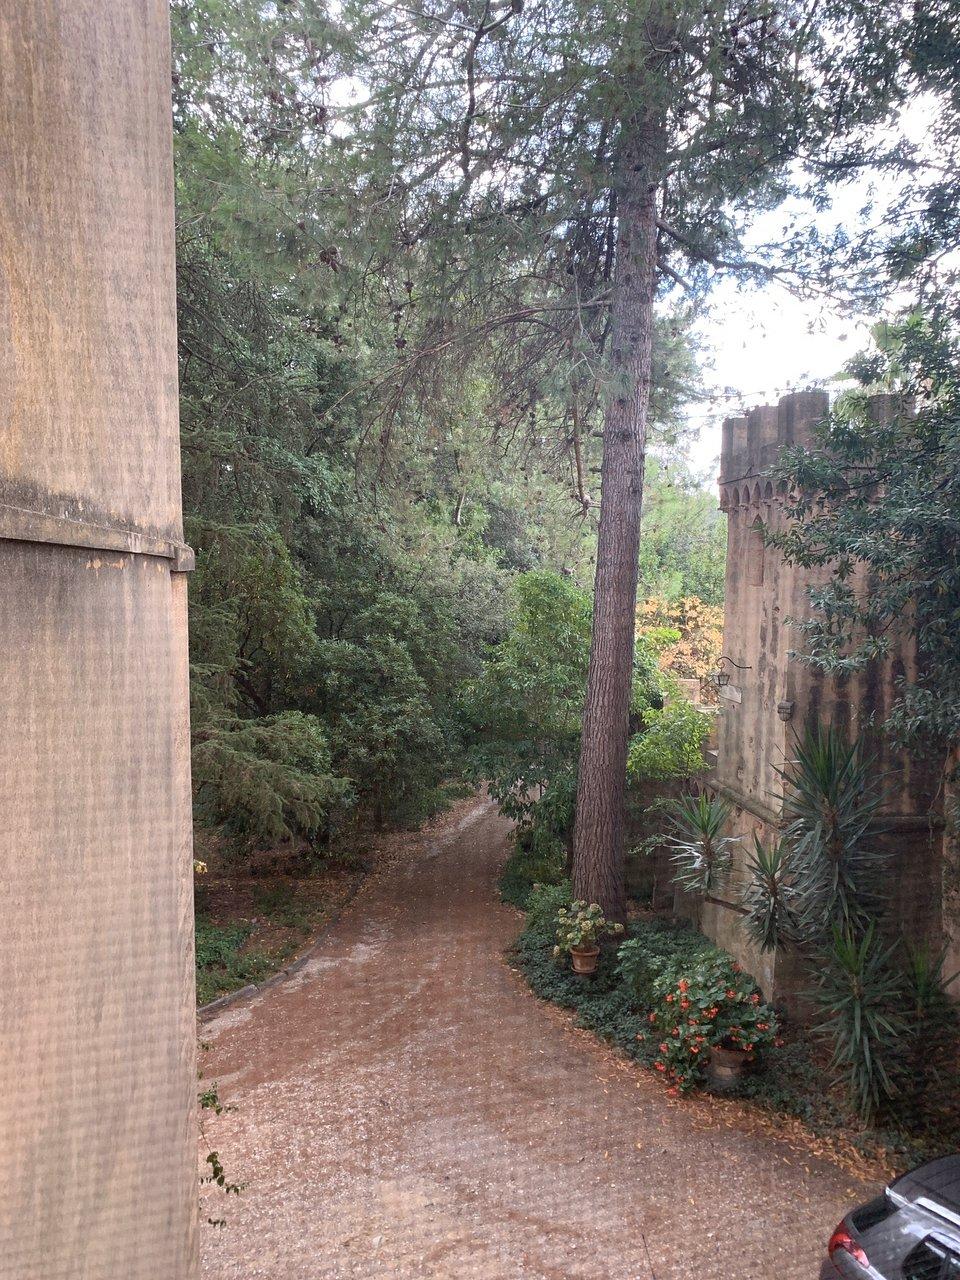 Via Pietro Nenni Giussano il mondo di giada (au$115): 2020 prices & reviews